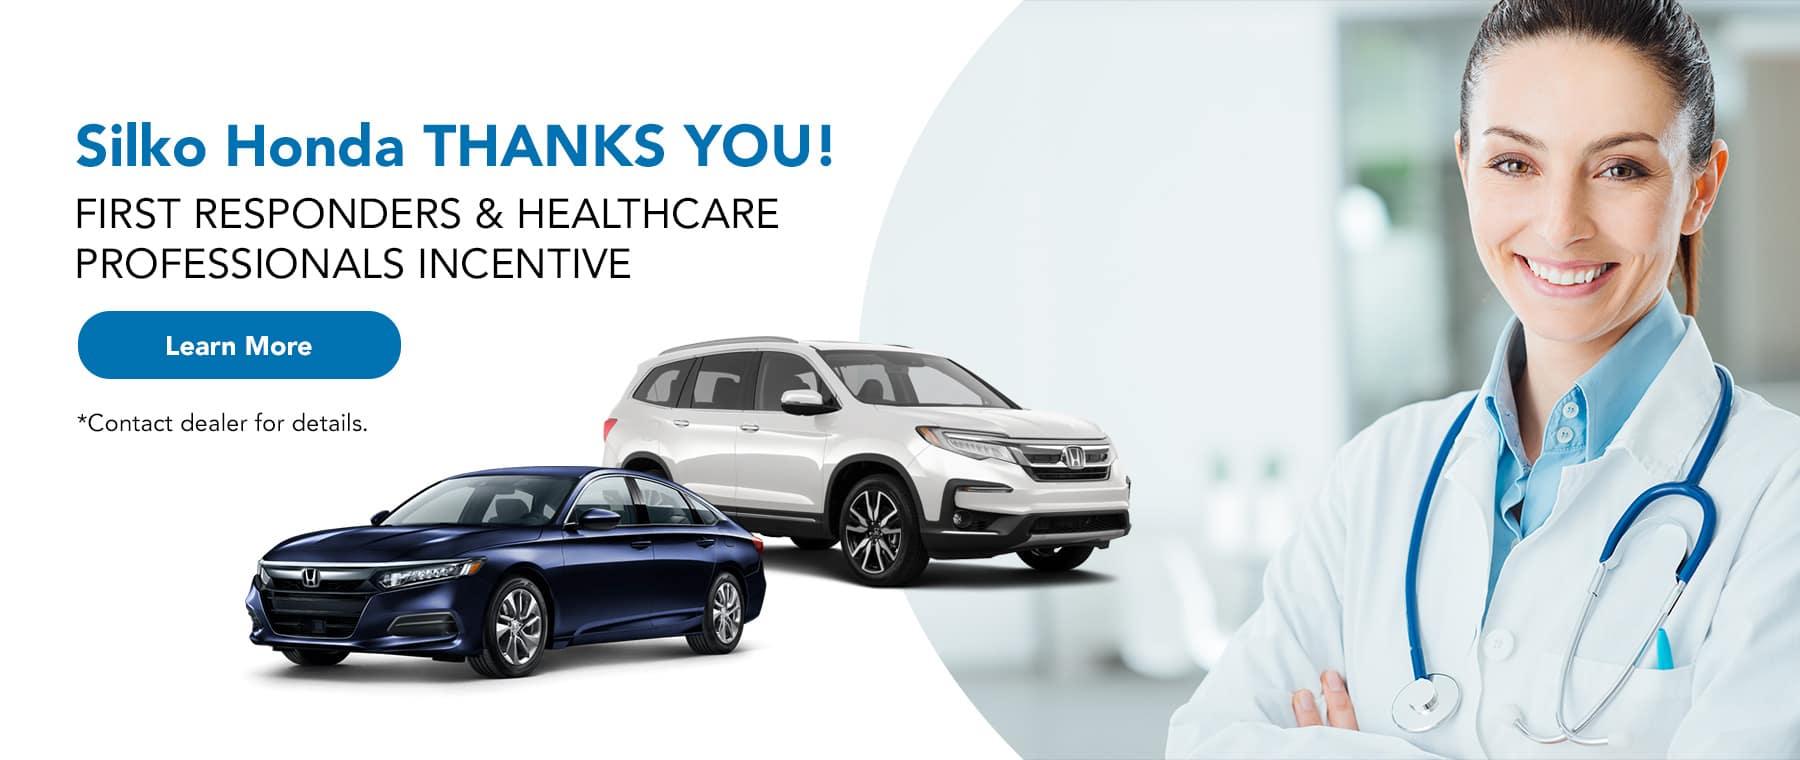 Silko Honda First Responder Incentive